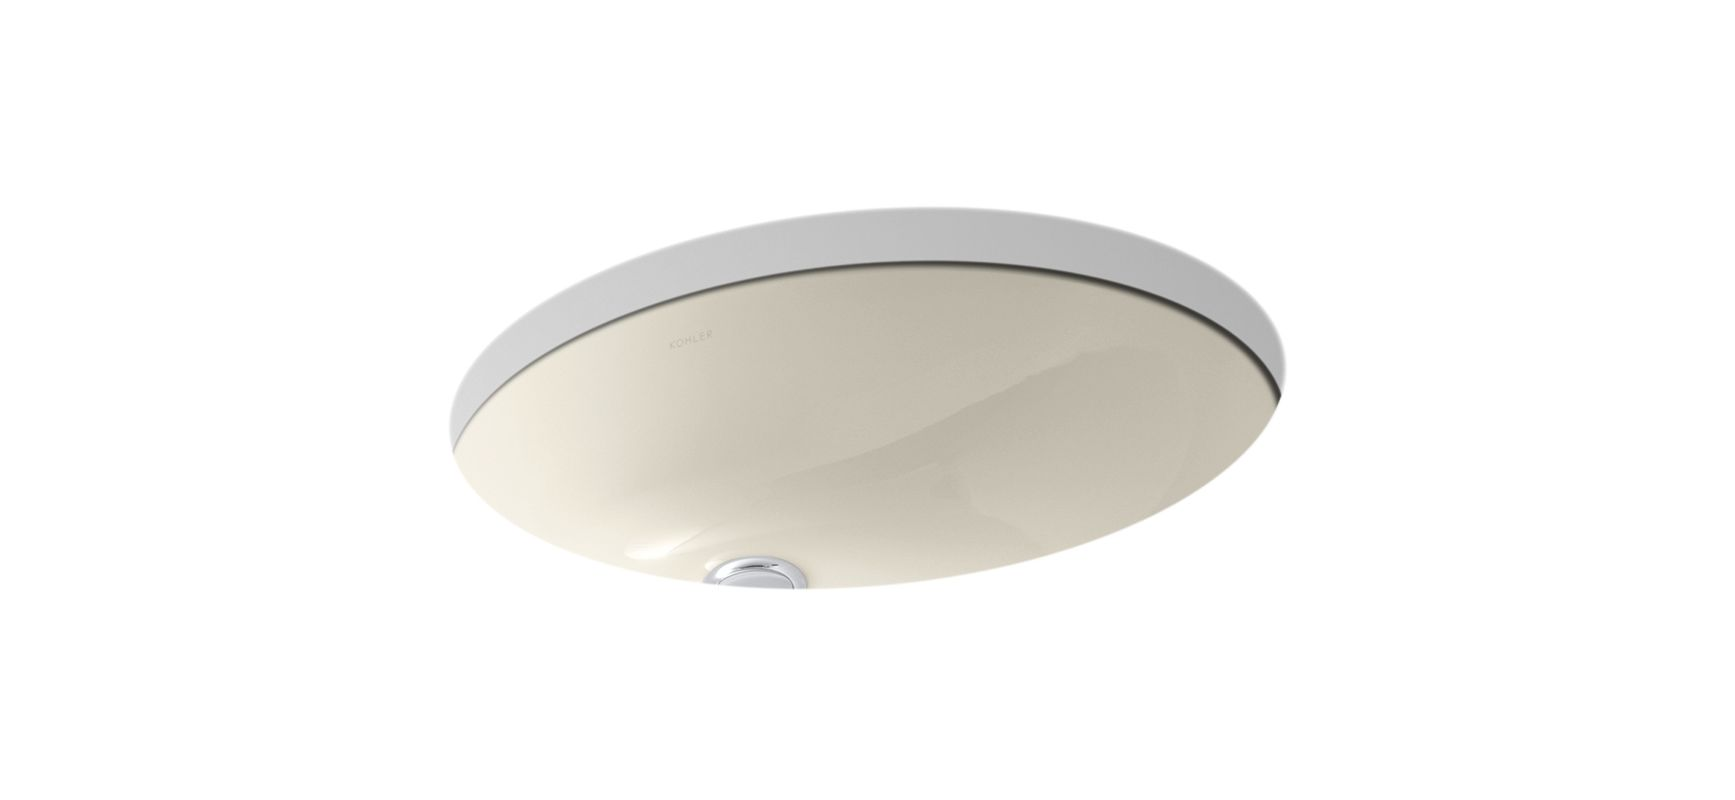 Kohler K 2210 47 Almond Caxton 17 Quot Undermount Bathroom